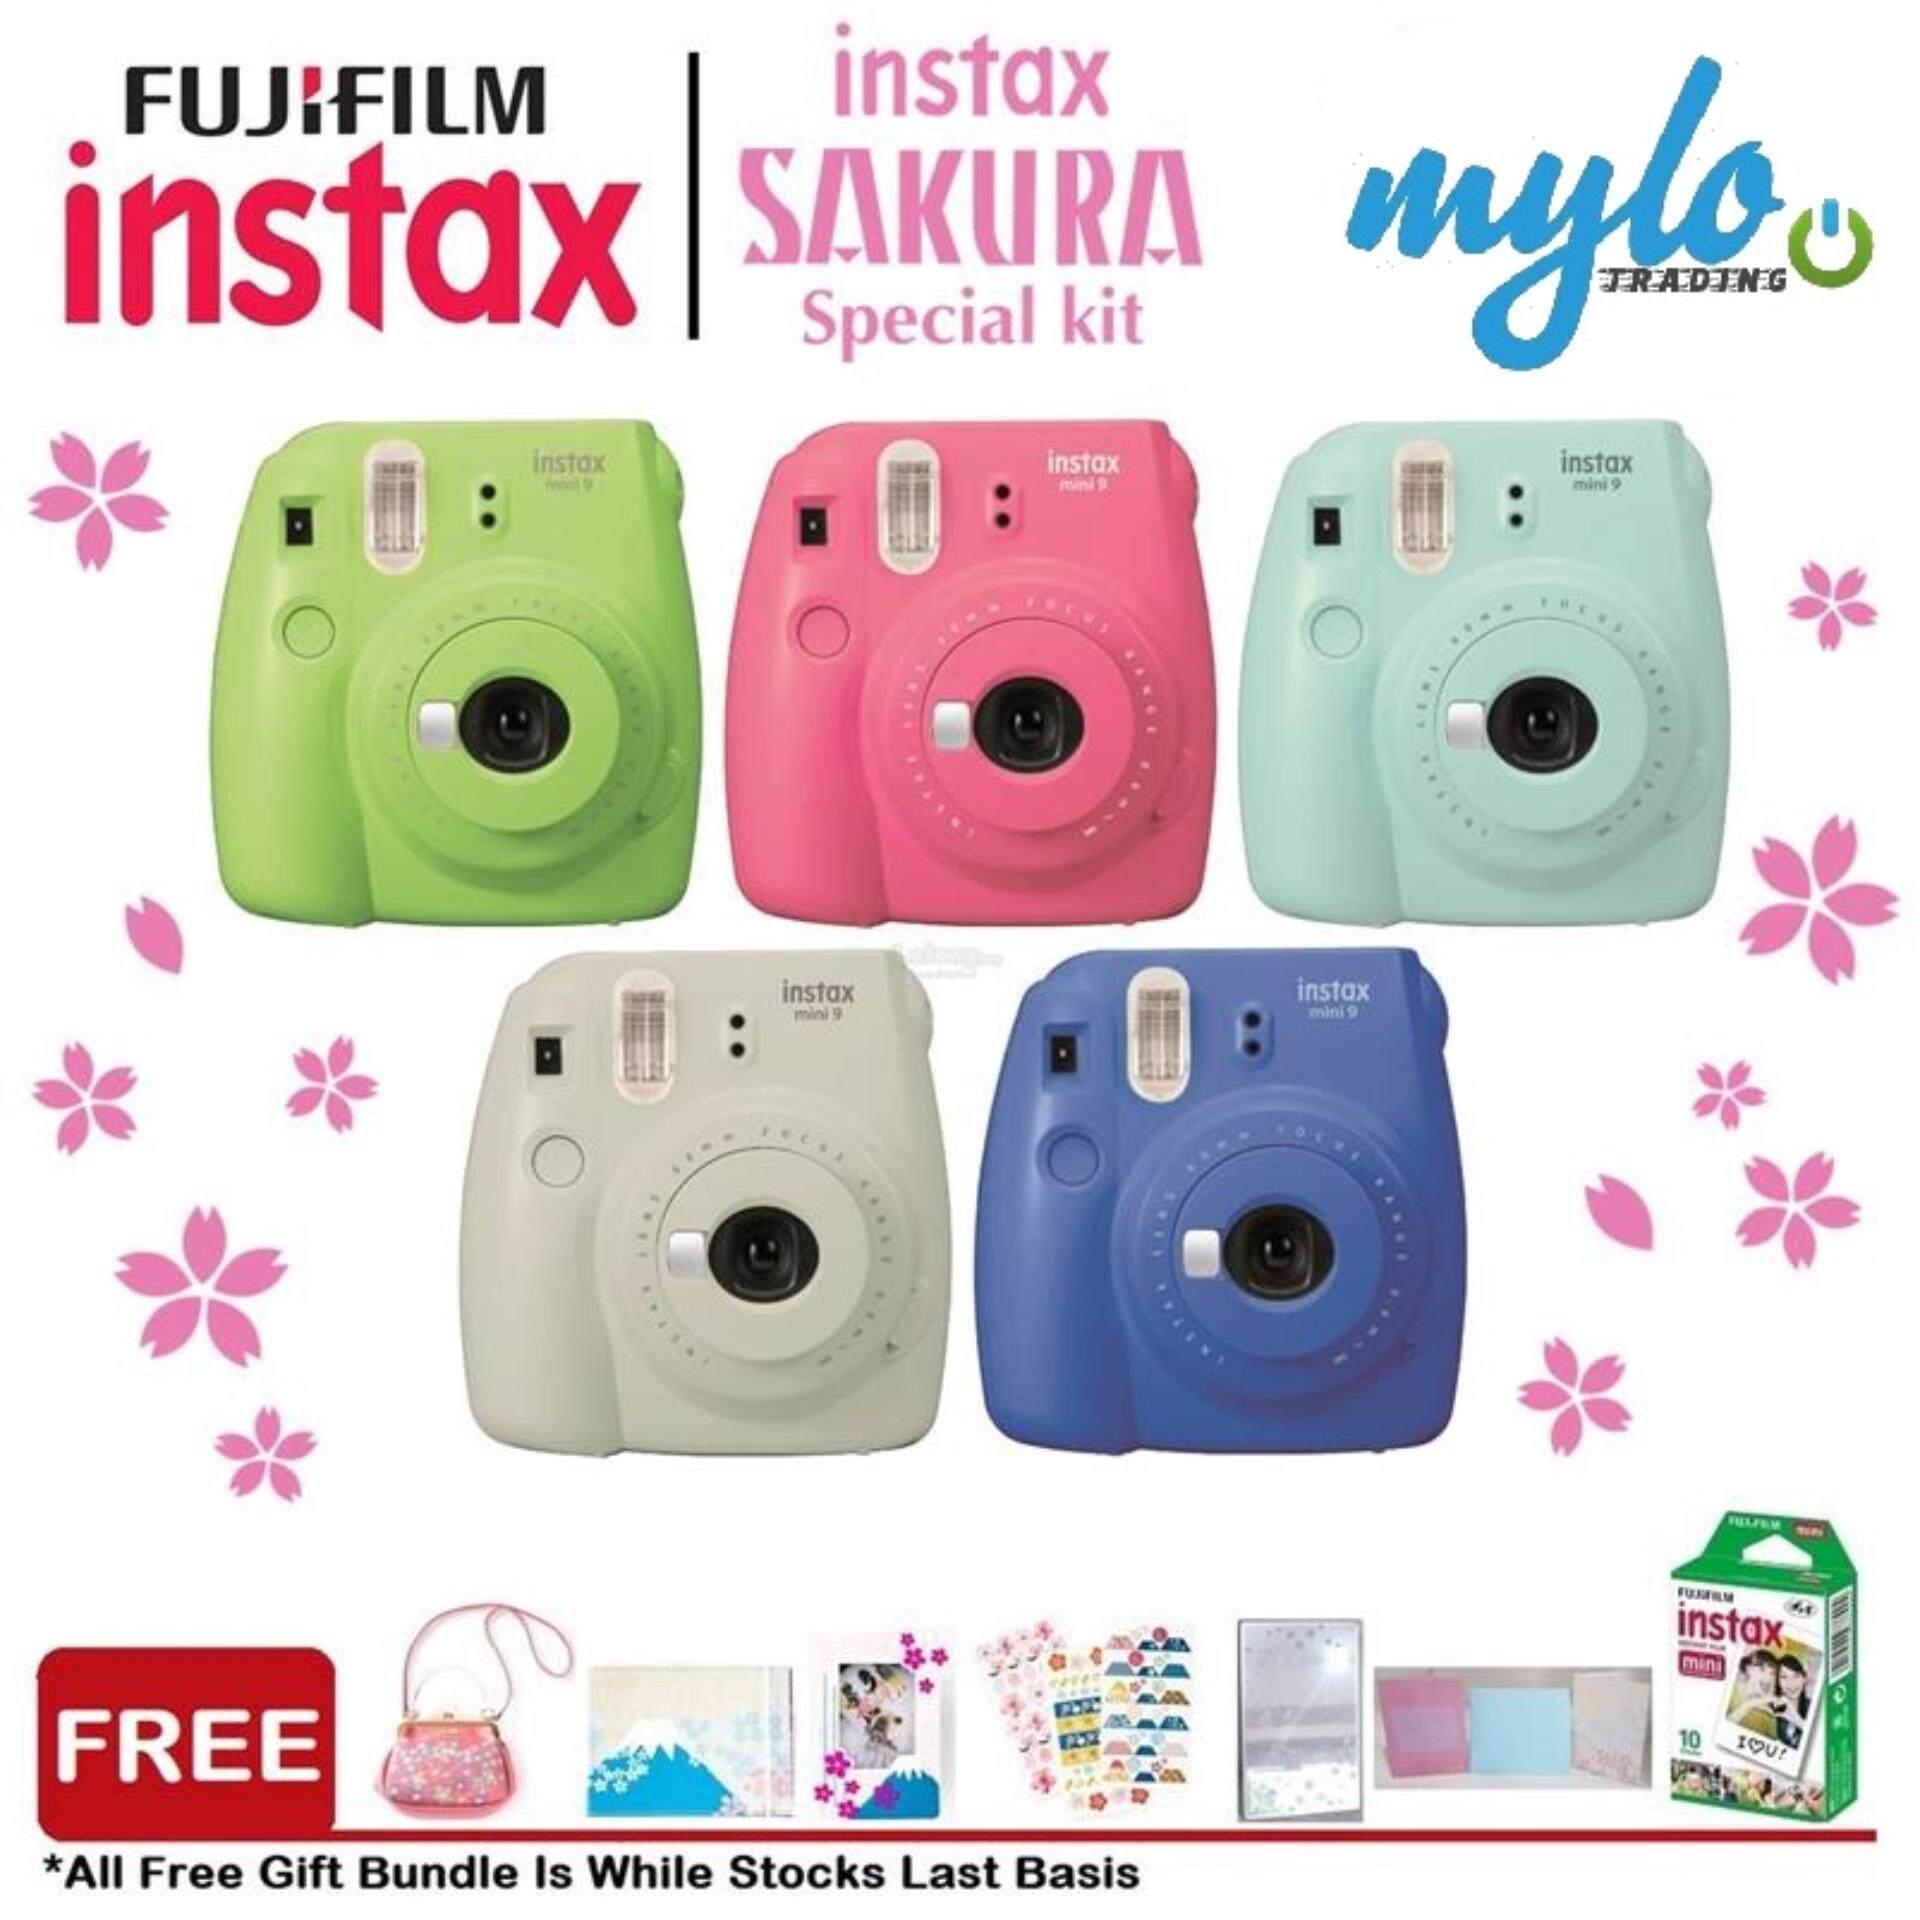 Fujifilm Instax Mini 9 Sakura Package By Mylo Trading Online Store.